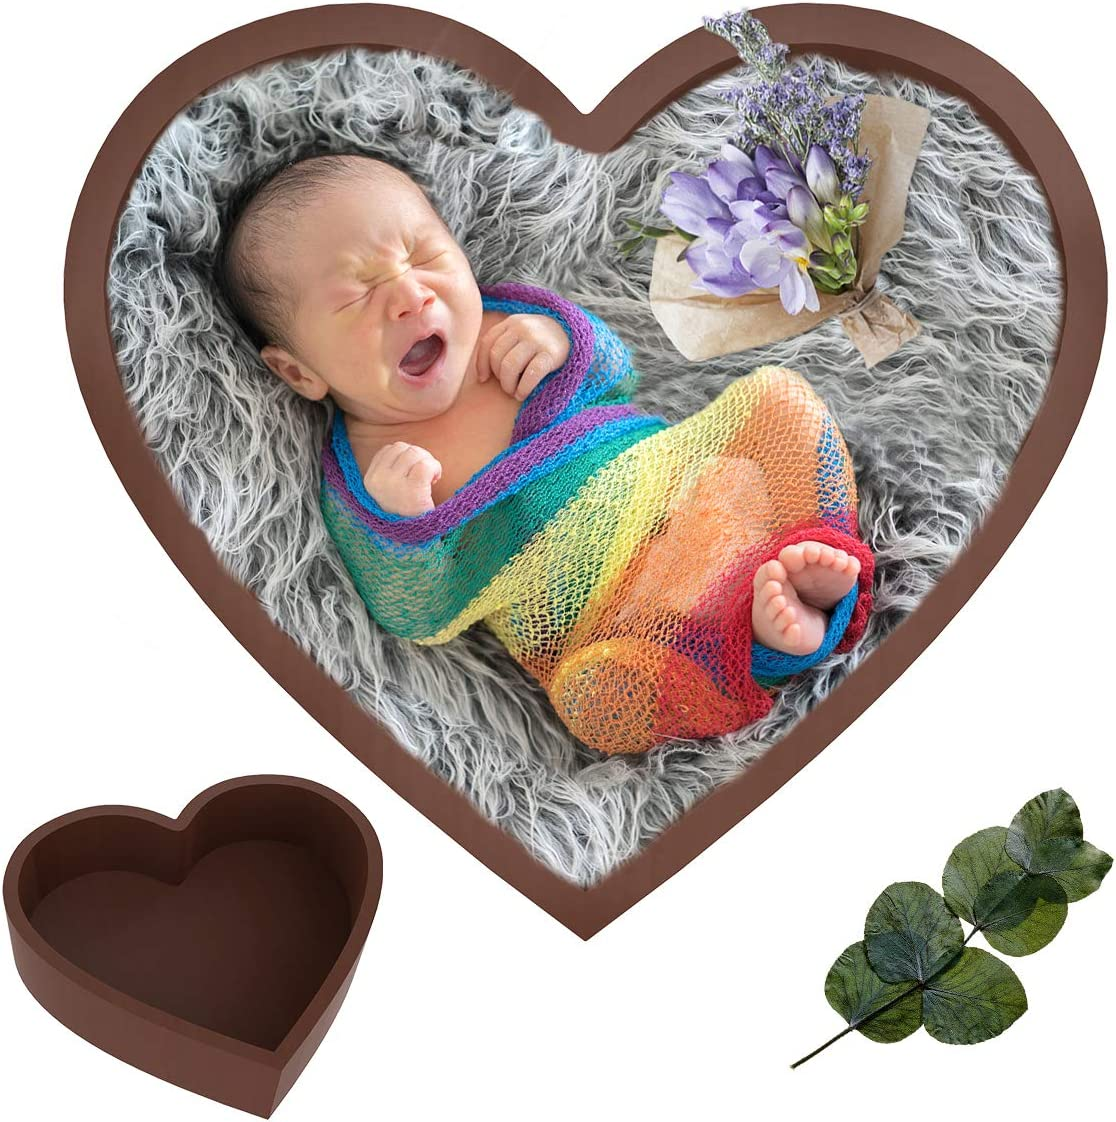 Rehomy Baby Photography Props Heart-Shaped Wooden Newborn Rare Bowl B Las Vegas Mall